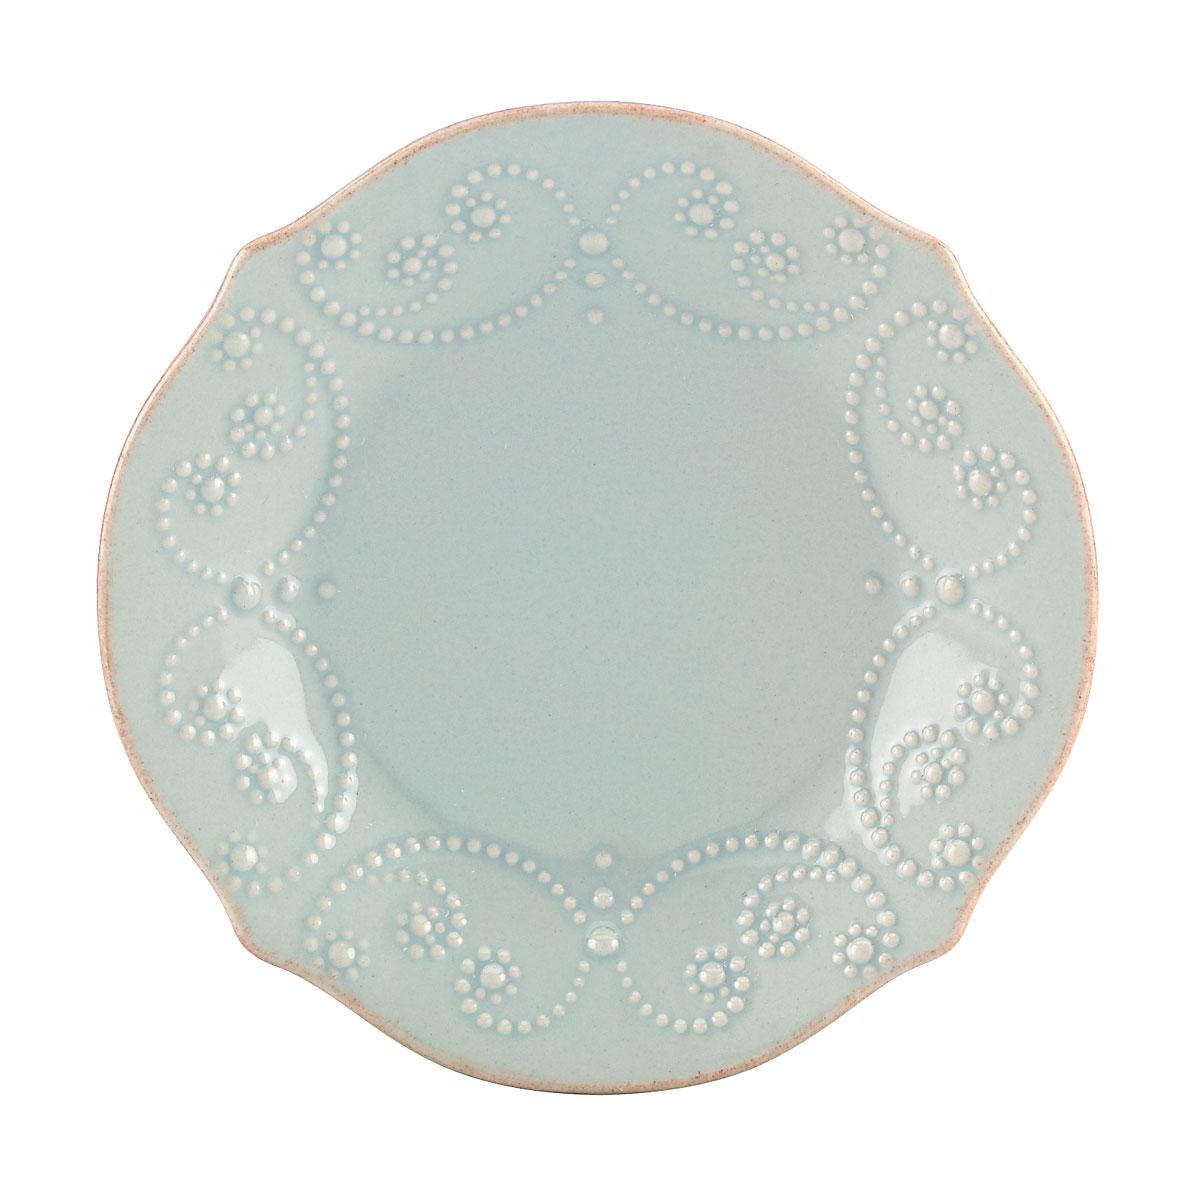 Lenox French Perle Blue Dinnerware Tidbit